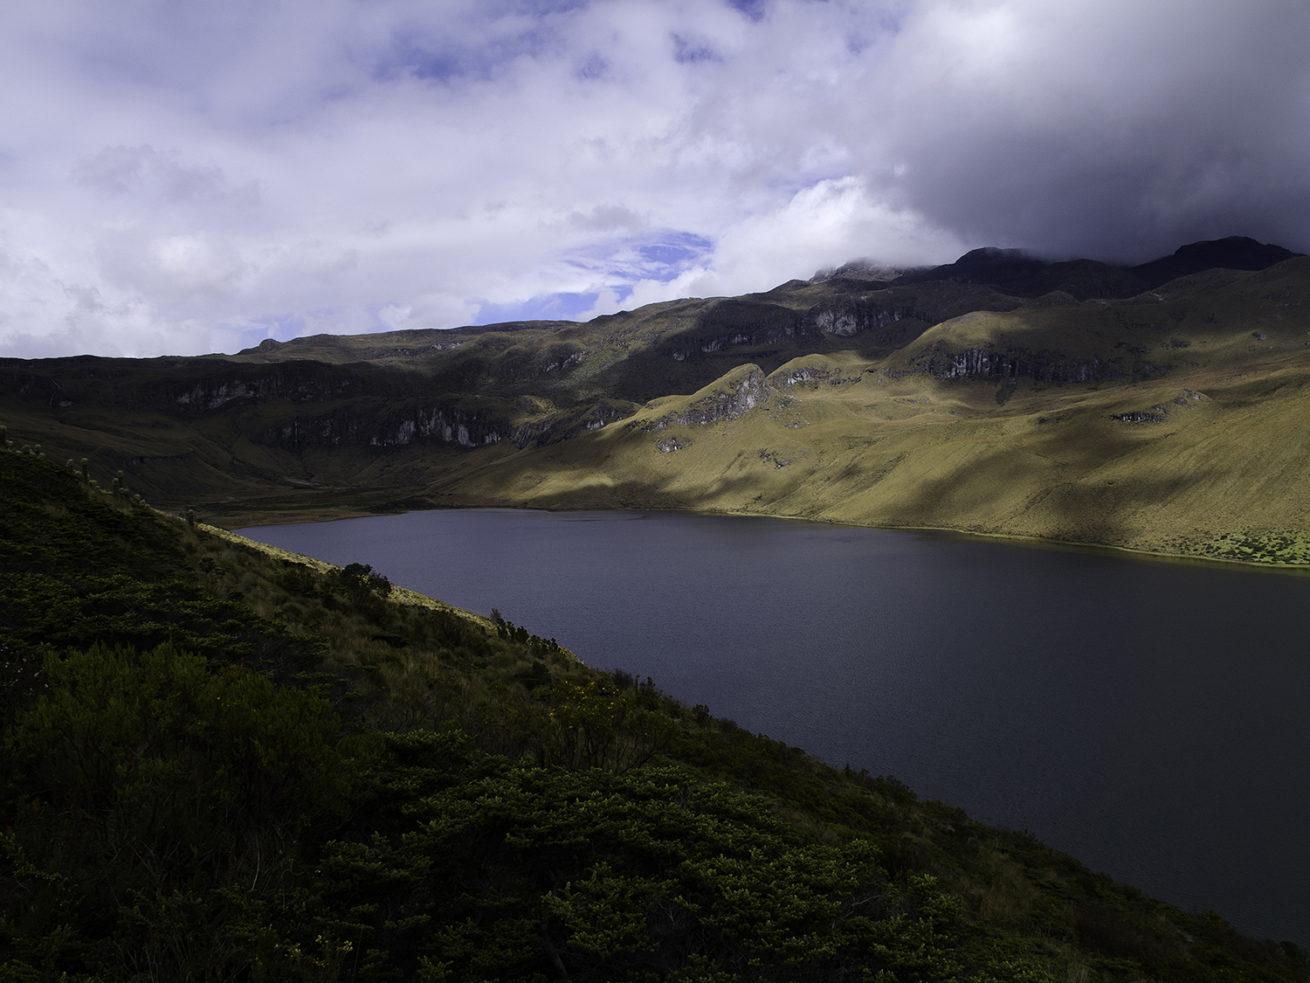 Los Nevados National Park - Andino, Colombia - Around Guides  Los Nevados National Park